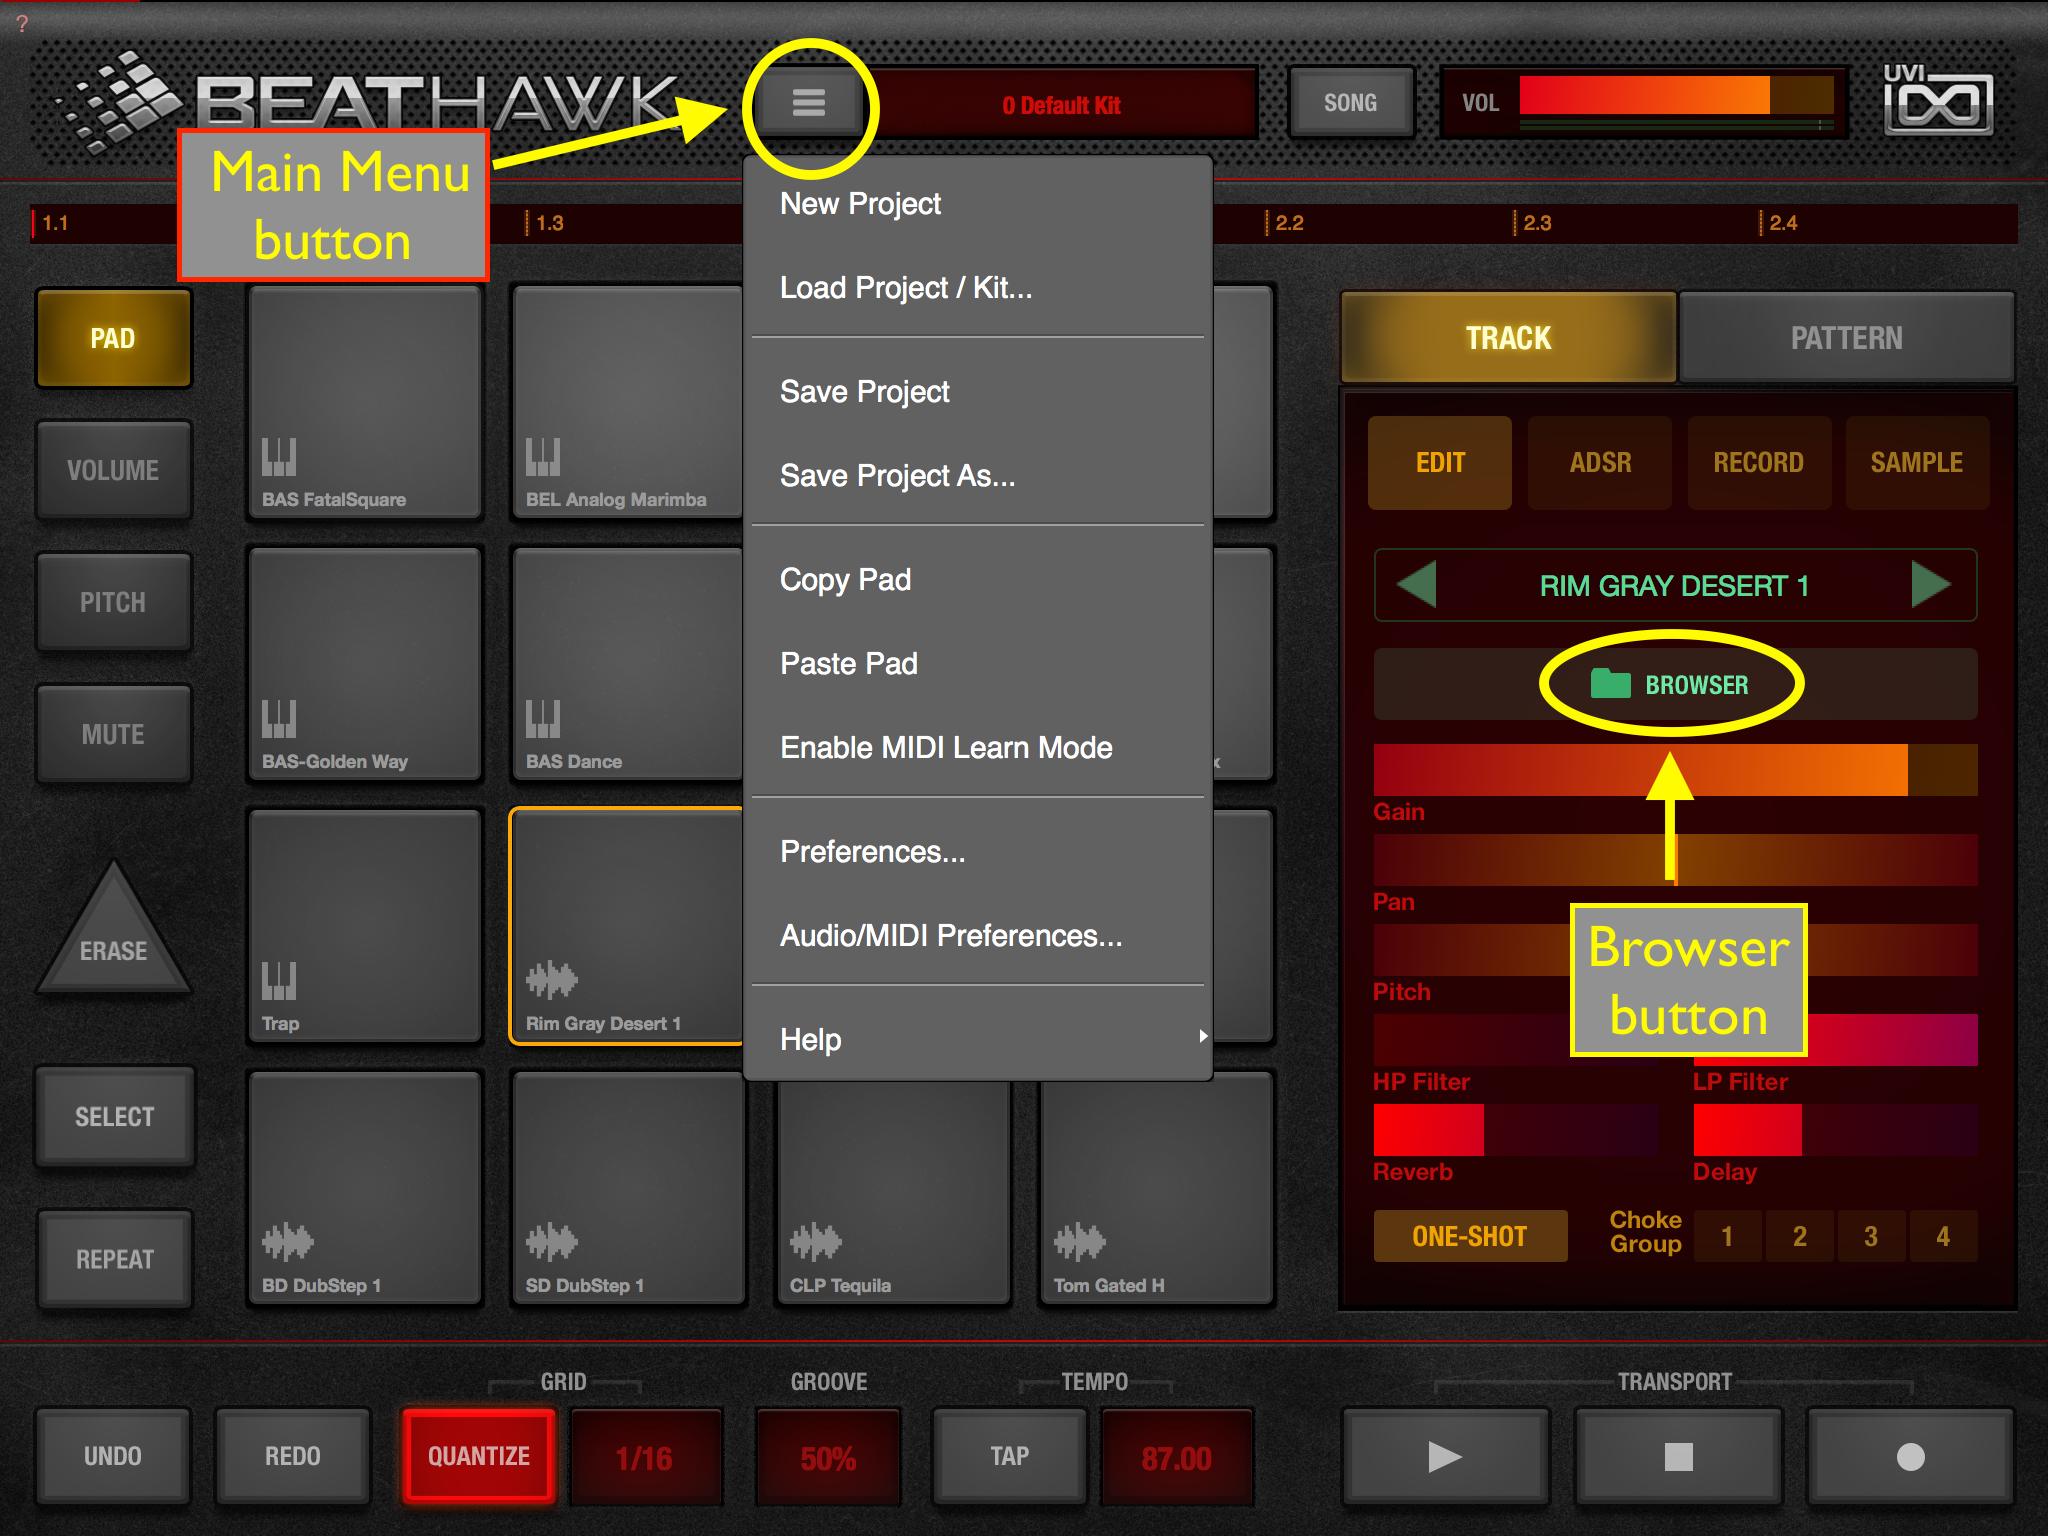 Revolutionize boring GarageBand tracks with killer drum